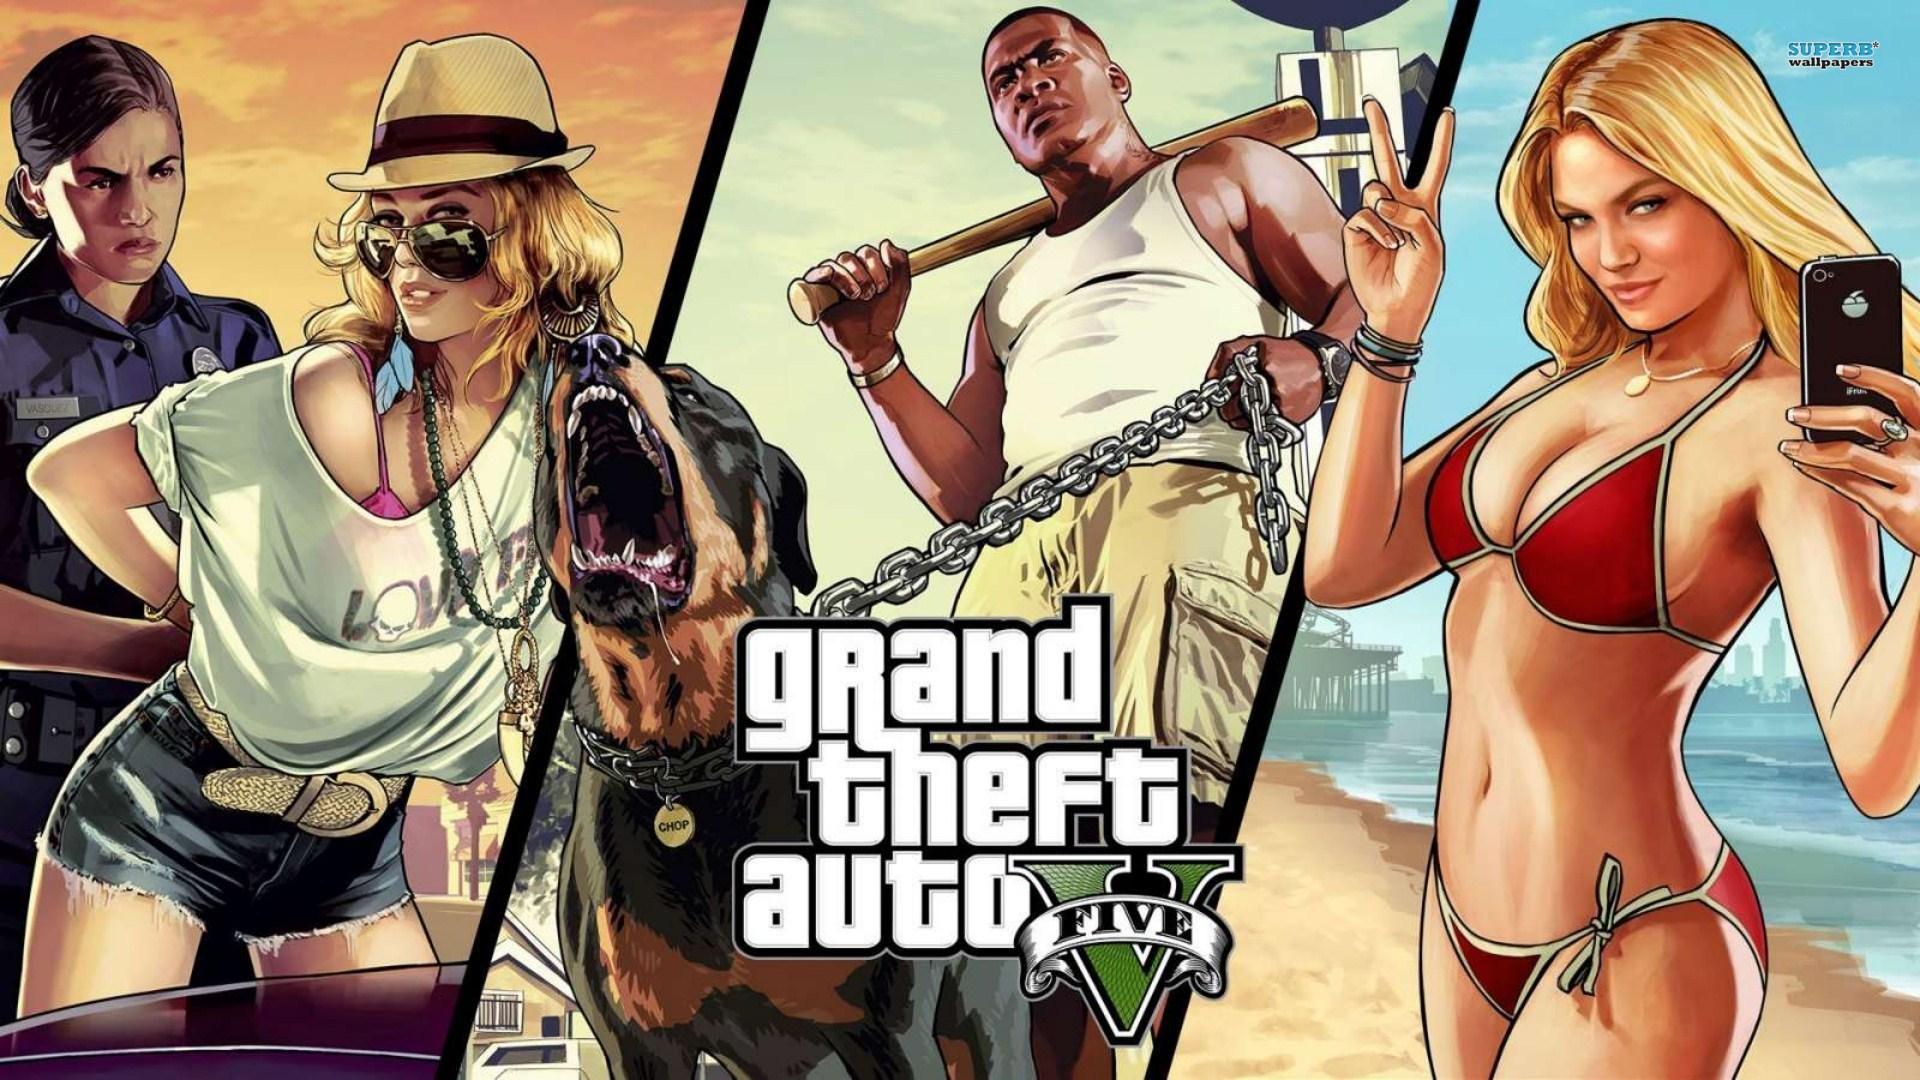 commander Grand Theft Auto 5